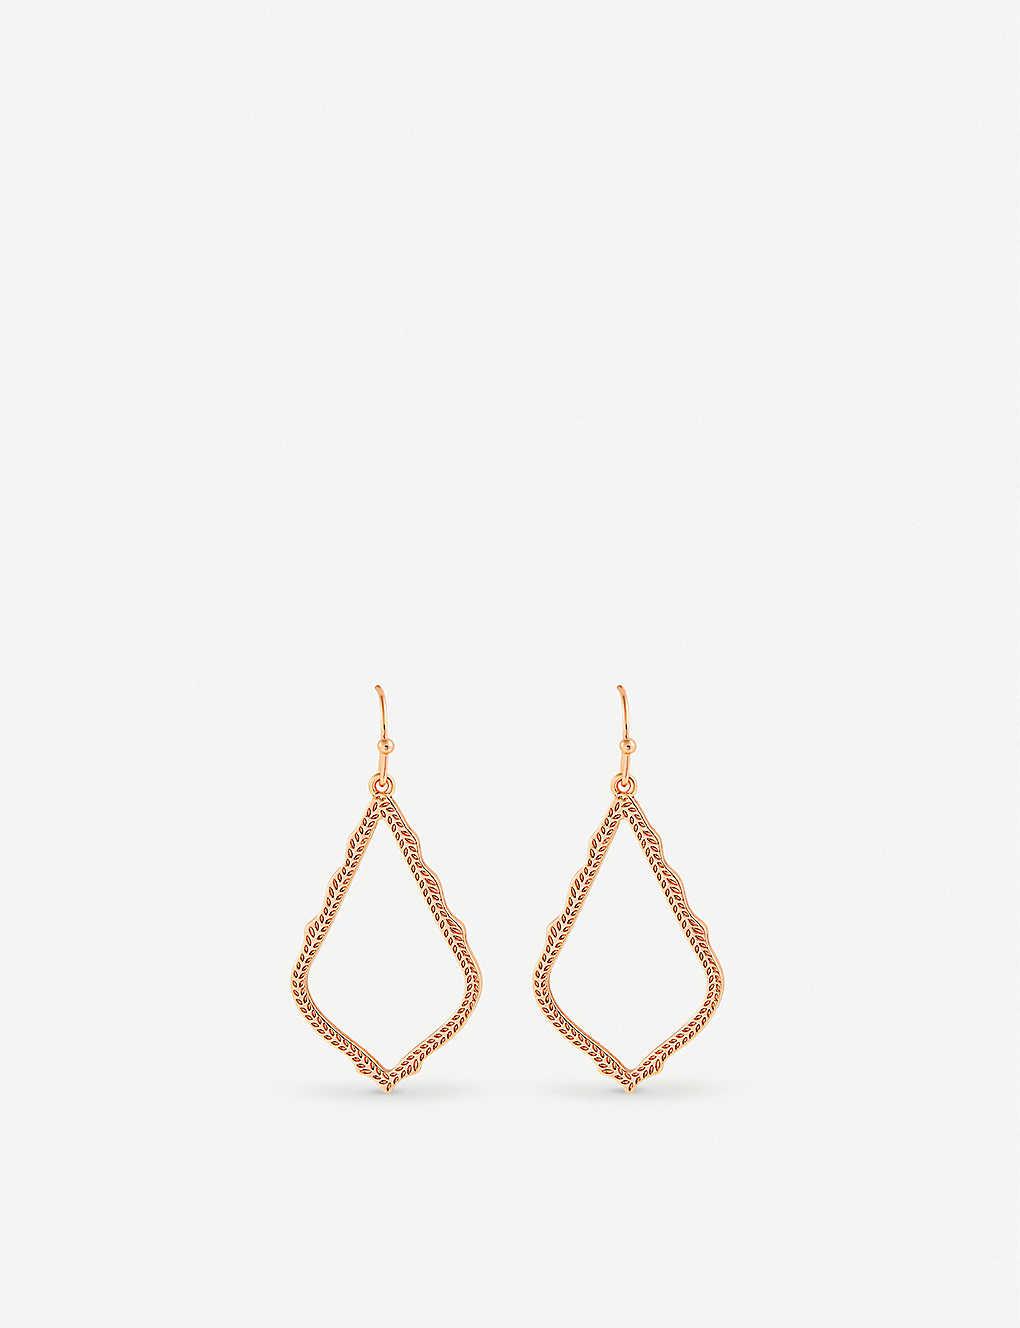 b76a94216c52b4 KENDRA SCOTT - Sophia rose-gold plated drop earrings   Selfridges.com